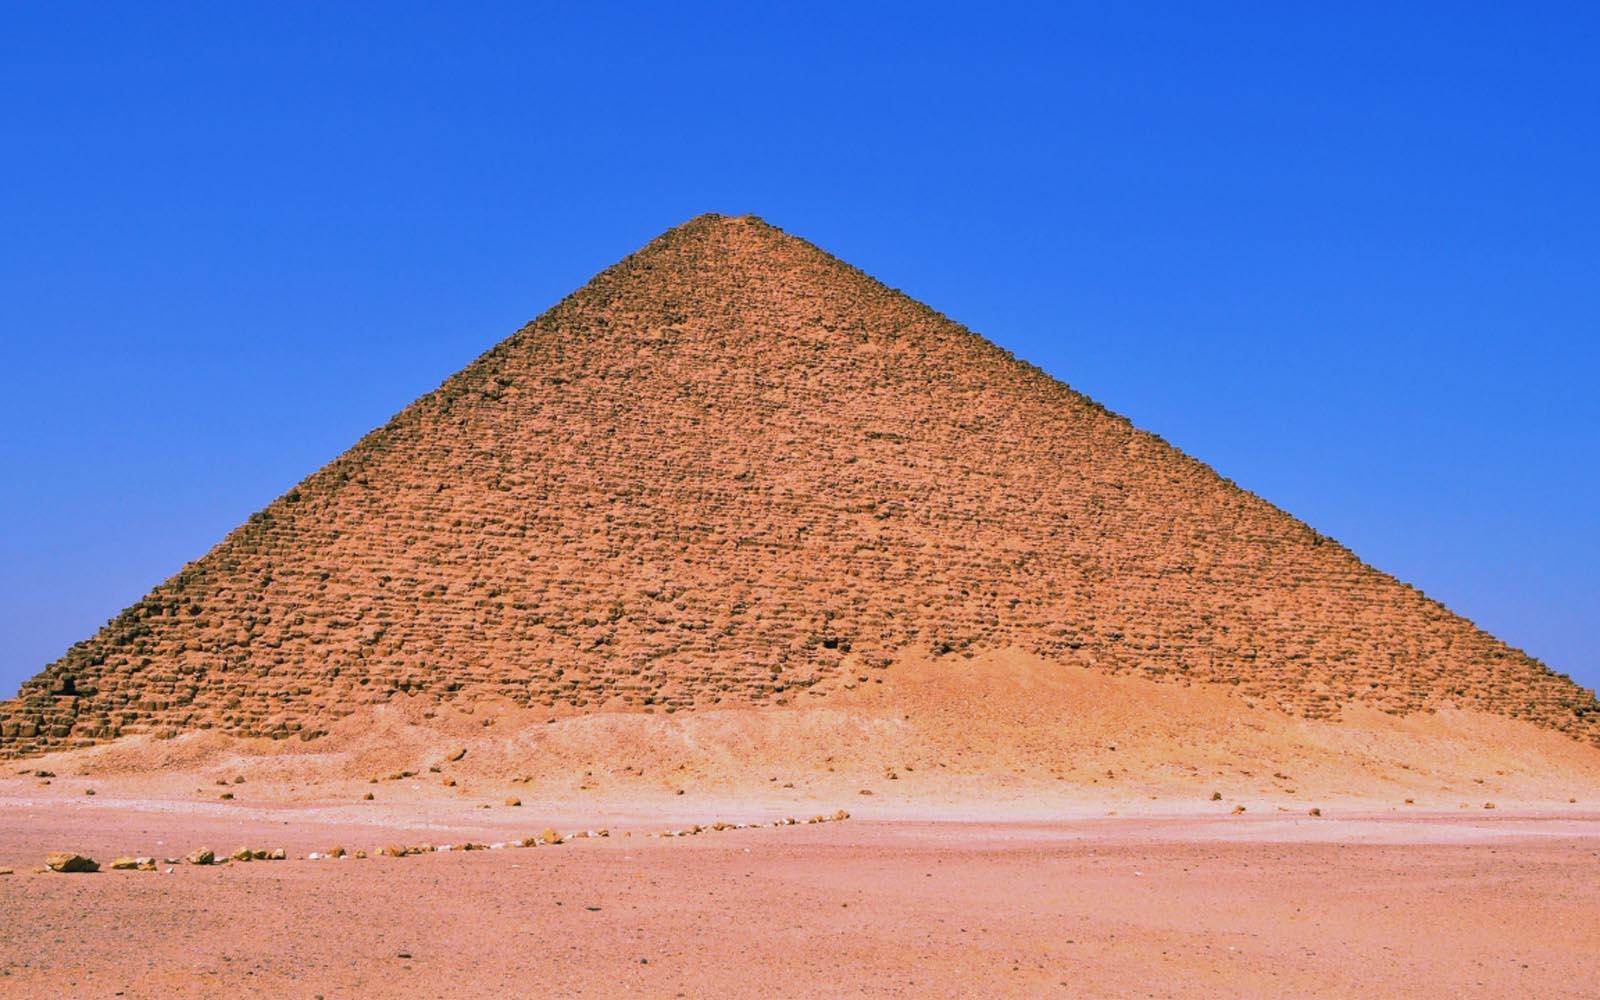 pyramid background-#20